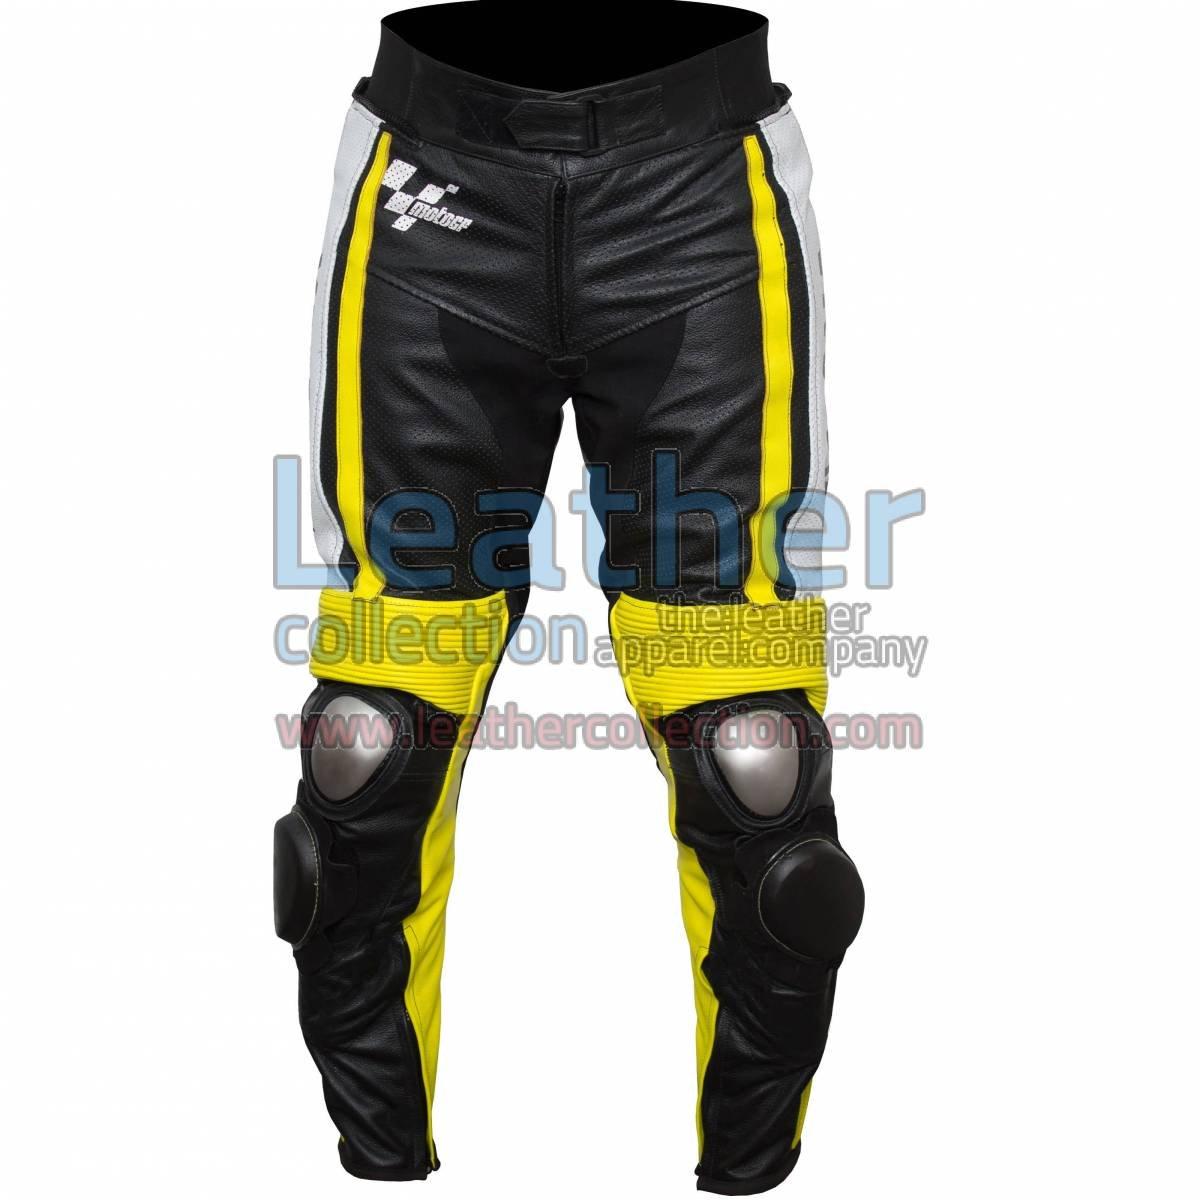 Ben Spies Yamaha Monster 2010 Motorbike Leather Pants